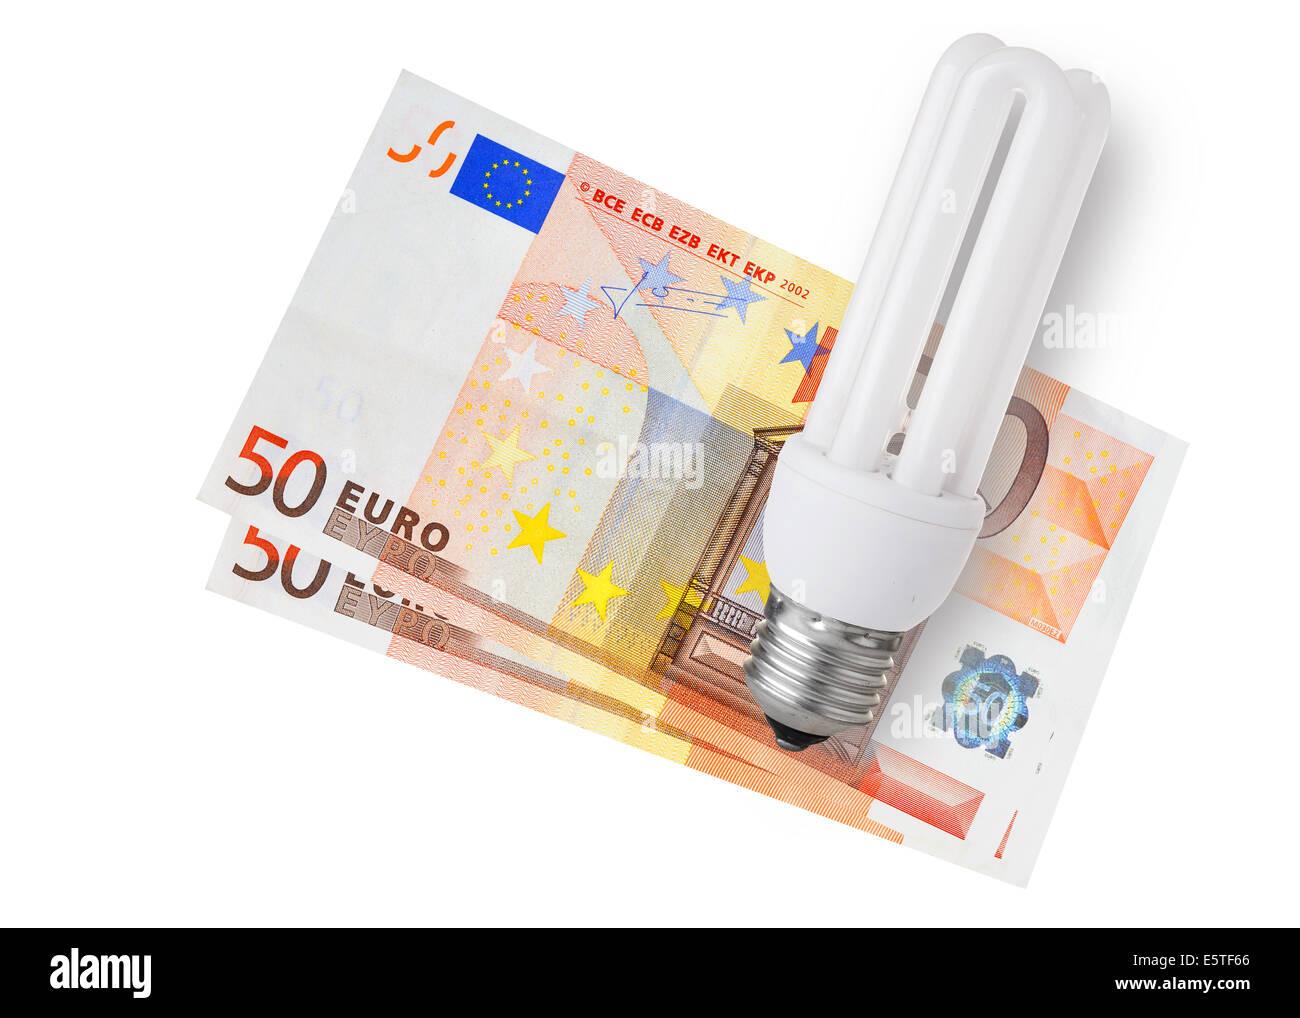 Energy saver bulb over euro bills on white background - Stock Image